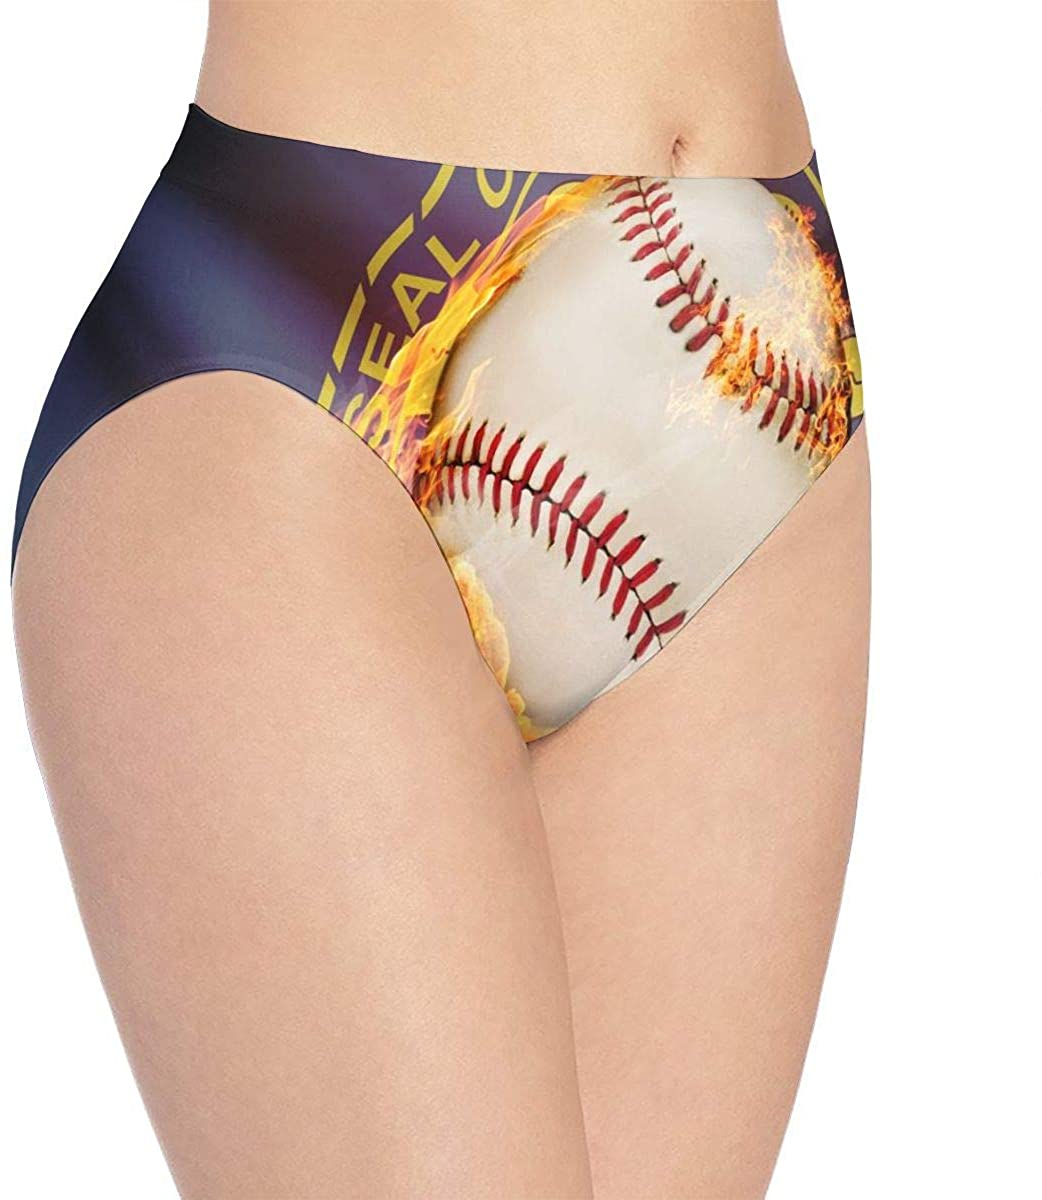 Womens Underwear Sports Baseball Nebraska Personalized Bikini Brief Hipster Panties Panty Ladies